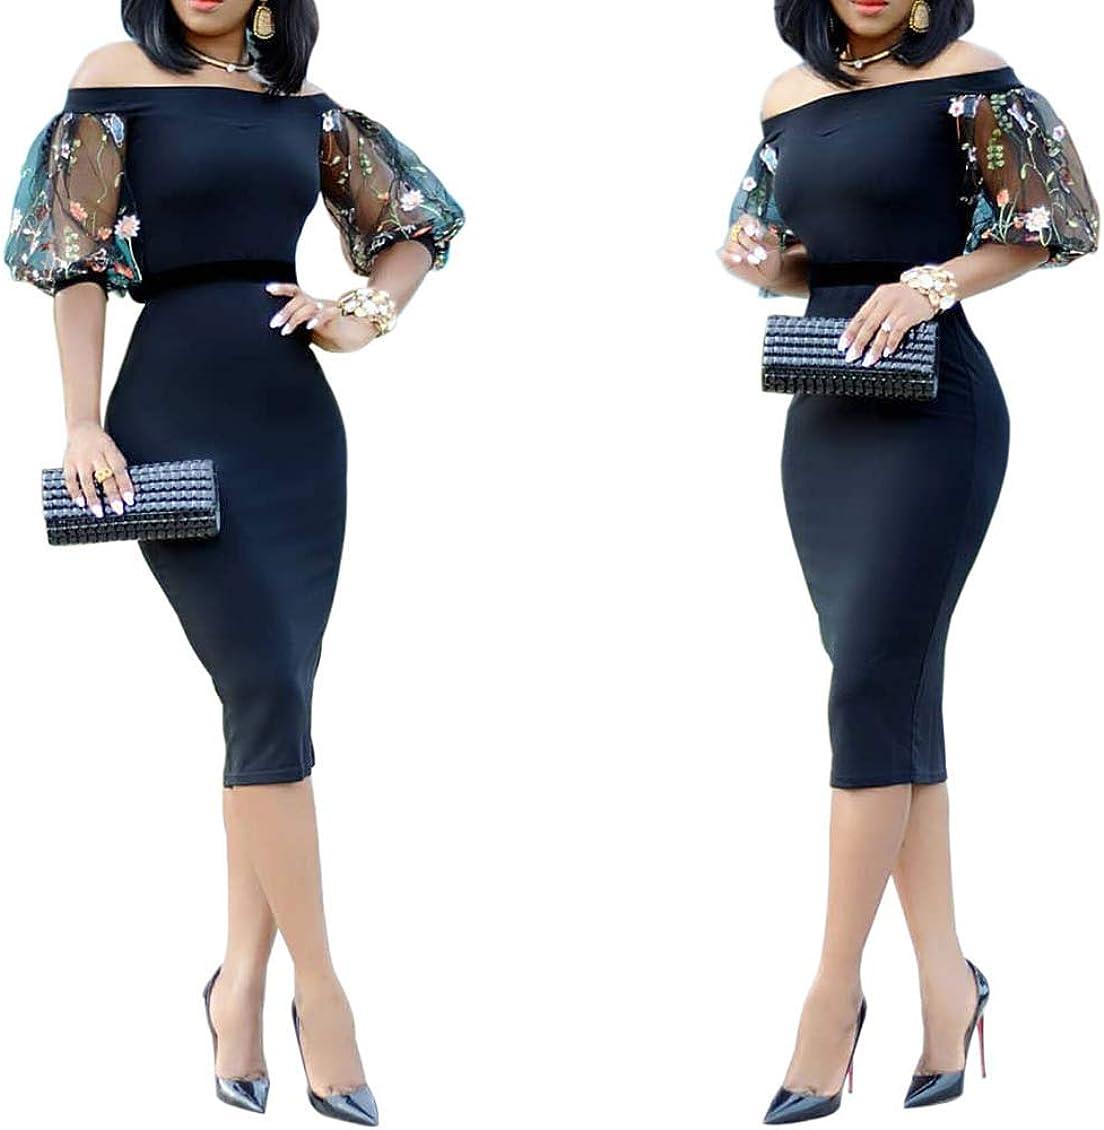 ECHOINE Womens Sexy Mesh Printed Dress - Bodycon Off Shoulder Party Midi Dresses Clubwear